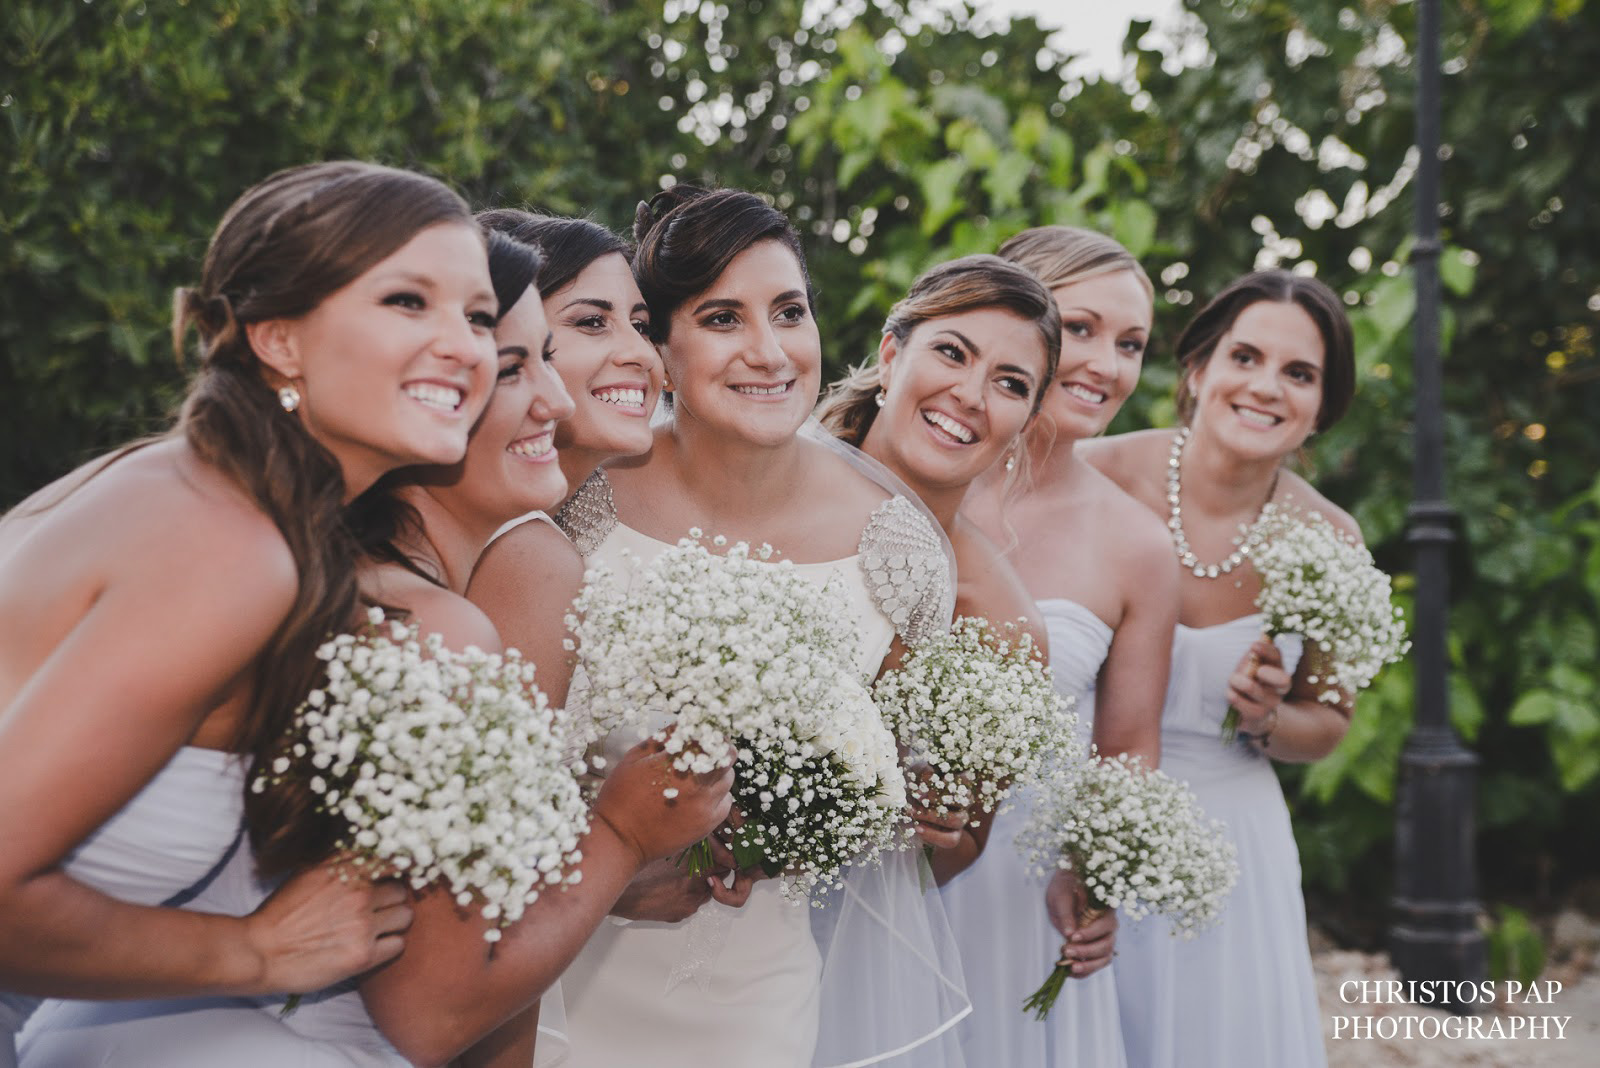 Greek wedding in Kos island